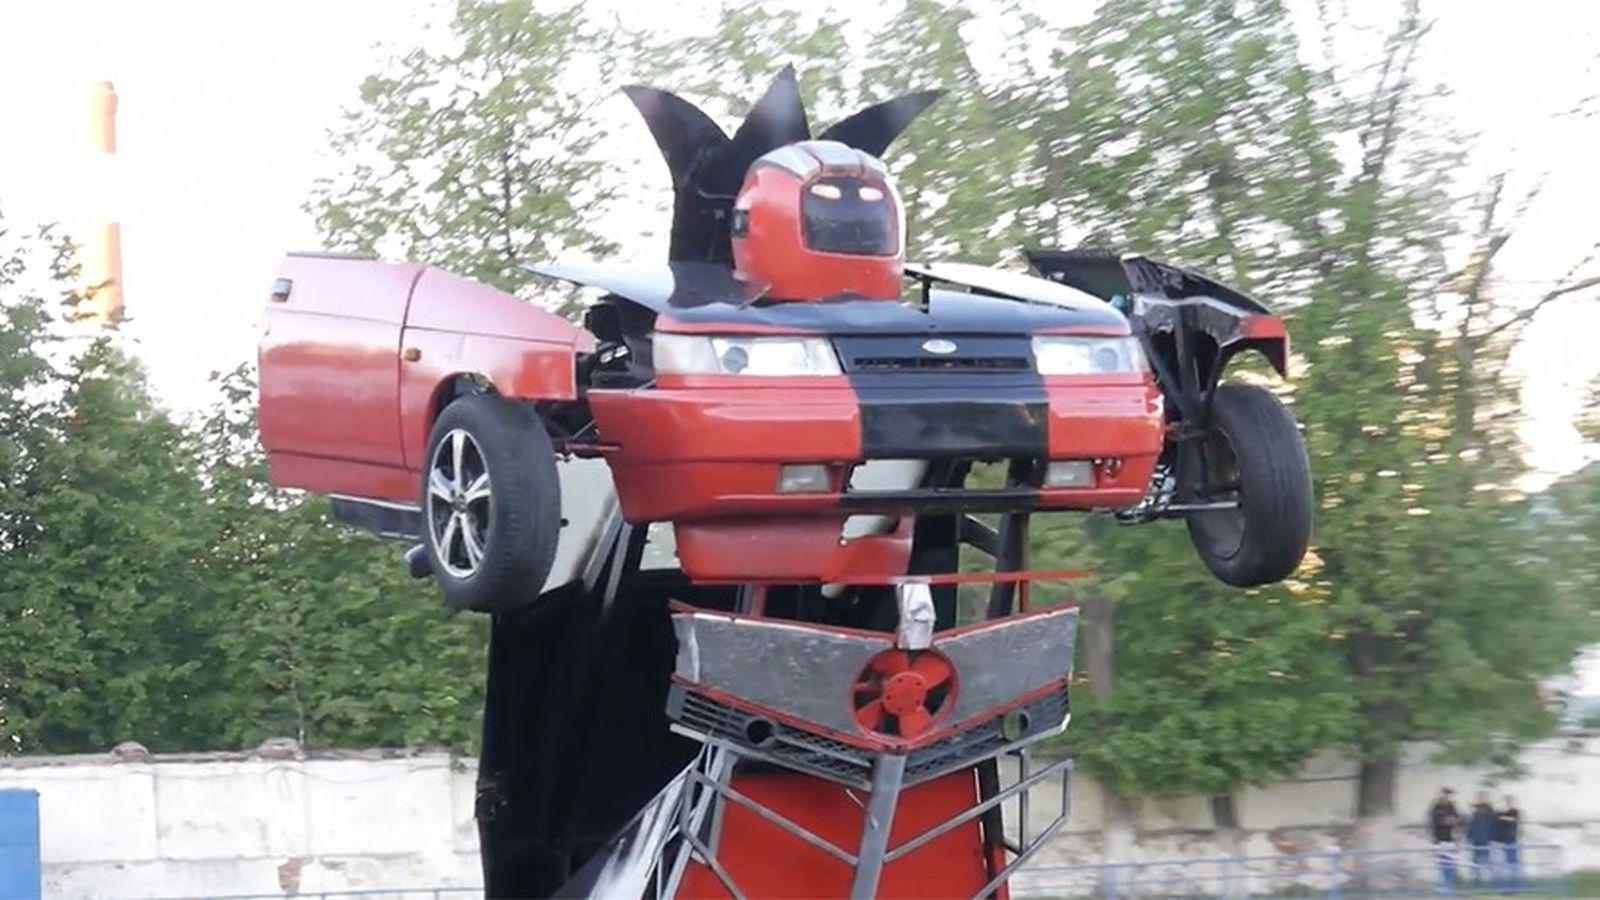 transformers irl deux russes inventent la lada qui se transforme en robot arm tech numerama. Black Bedroom Furniture Sets. Home Design Ideas